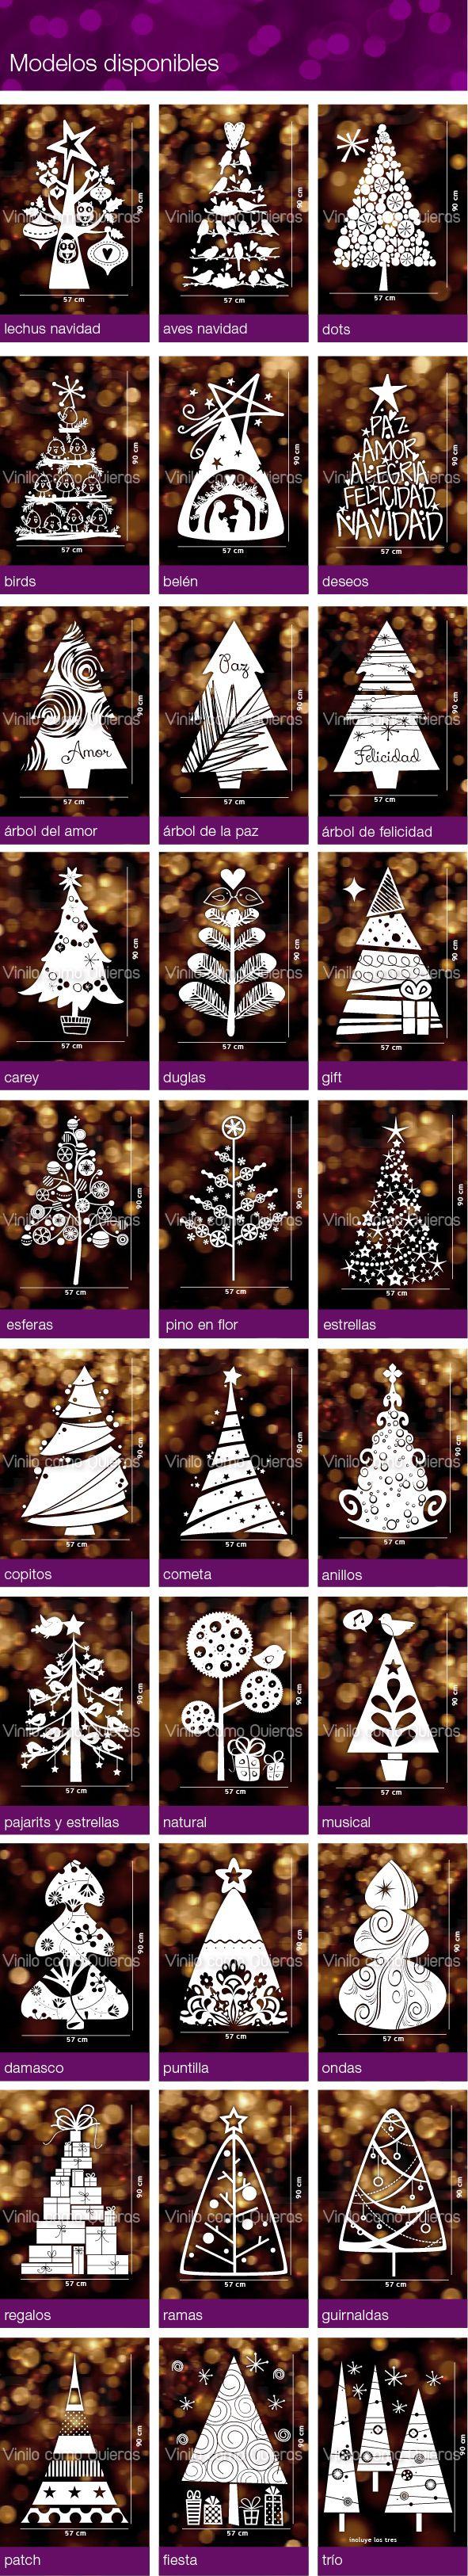 arboles navidad 2015-02